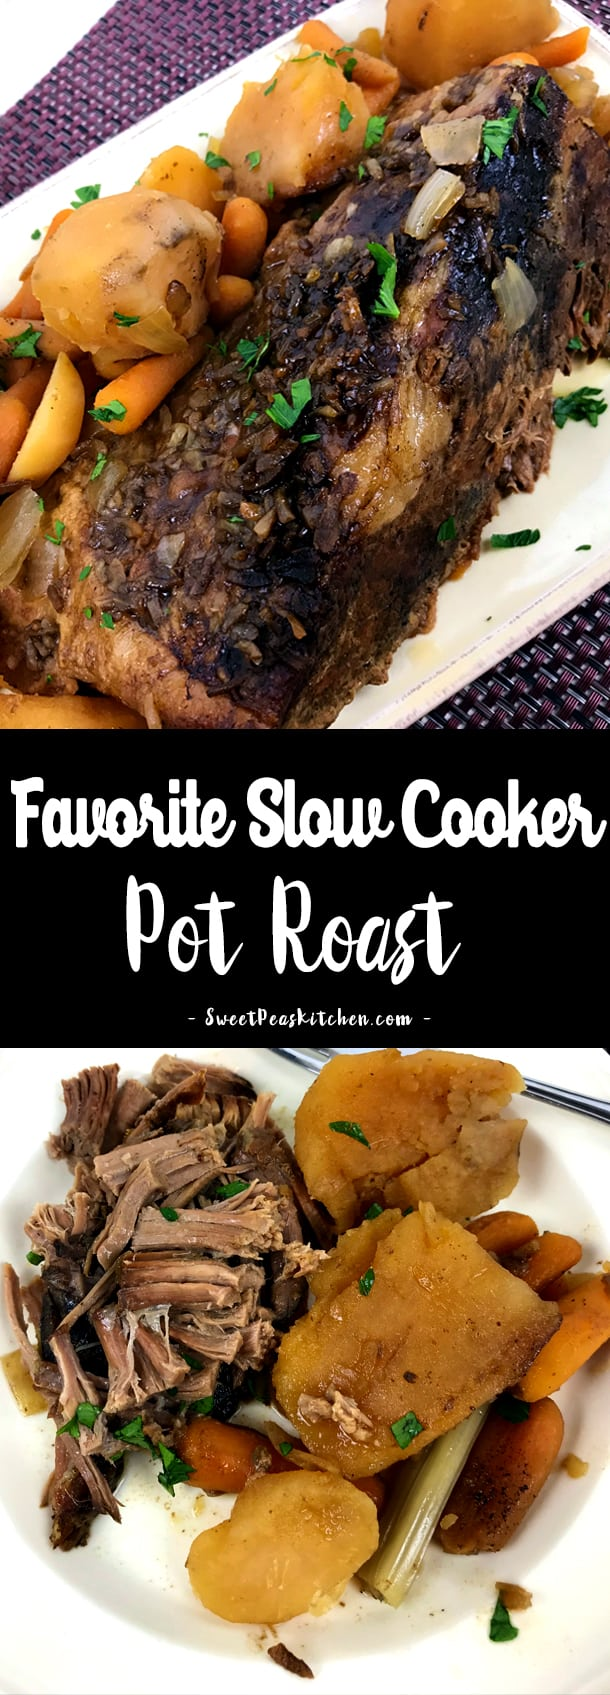 Favorite Slow Cooker Pot Roast